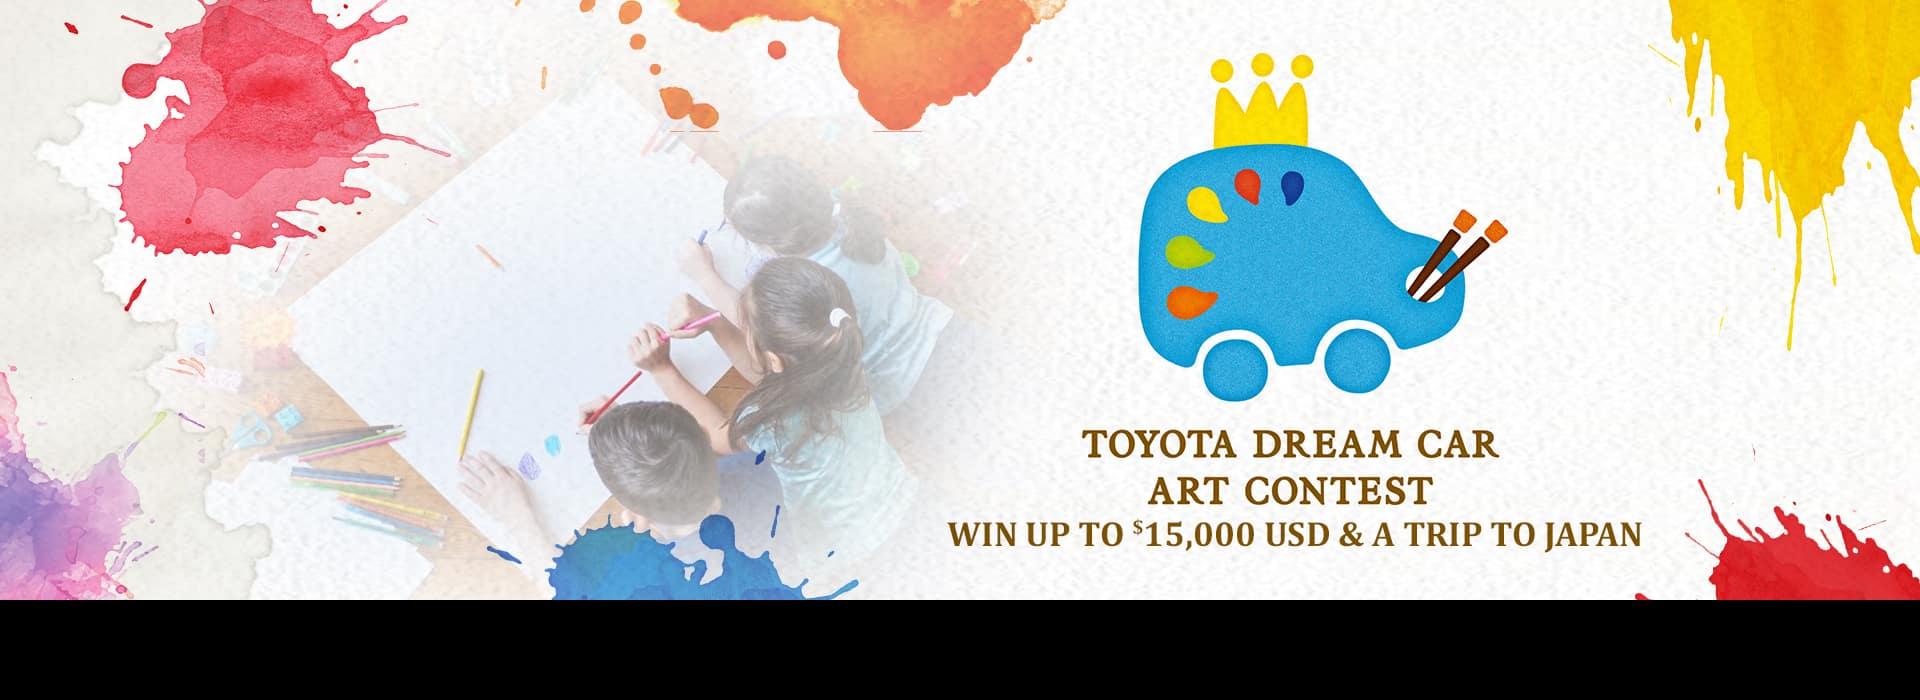 Dream_Car_Event_Posts_Desktop_Toyota_2021